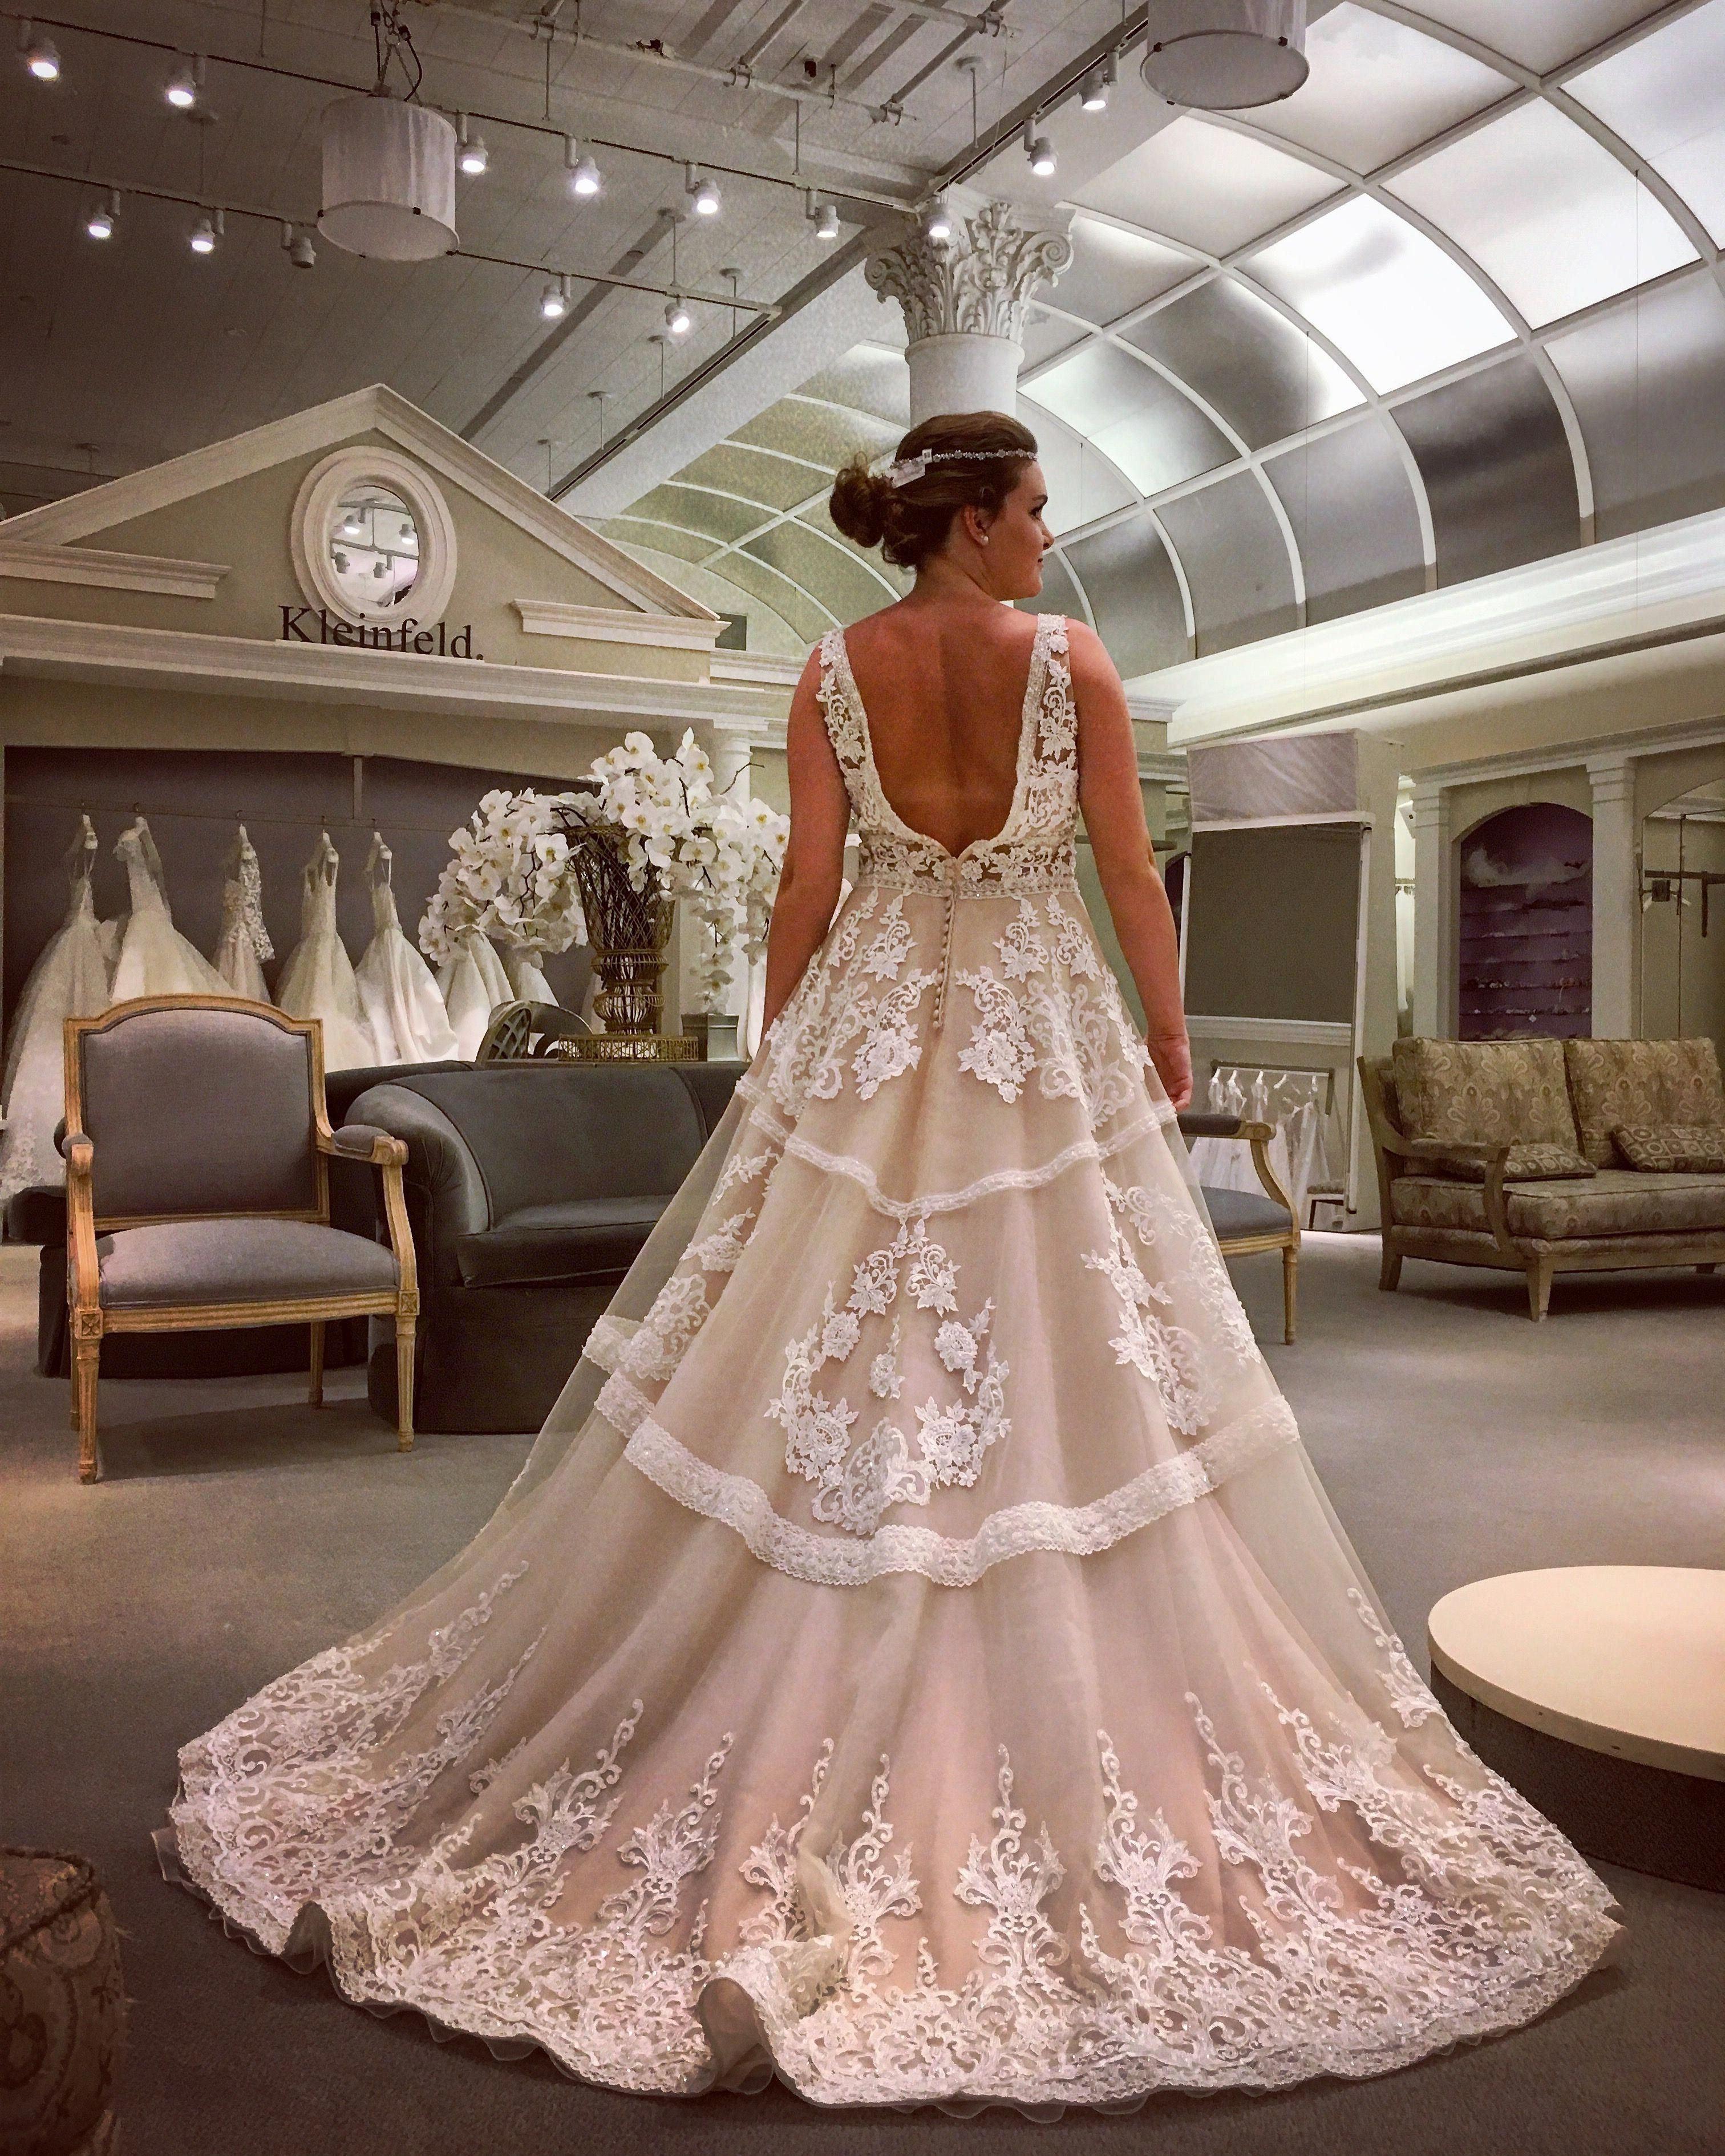 Randy Fenoli Wedding Dress. RUSTIC. Whimsical